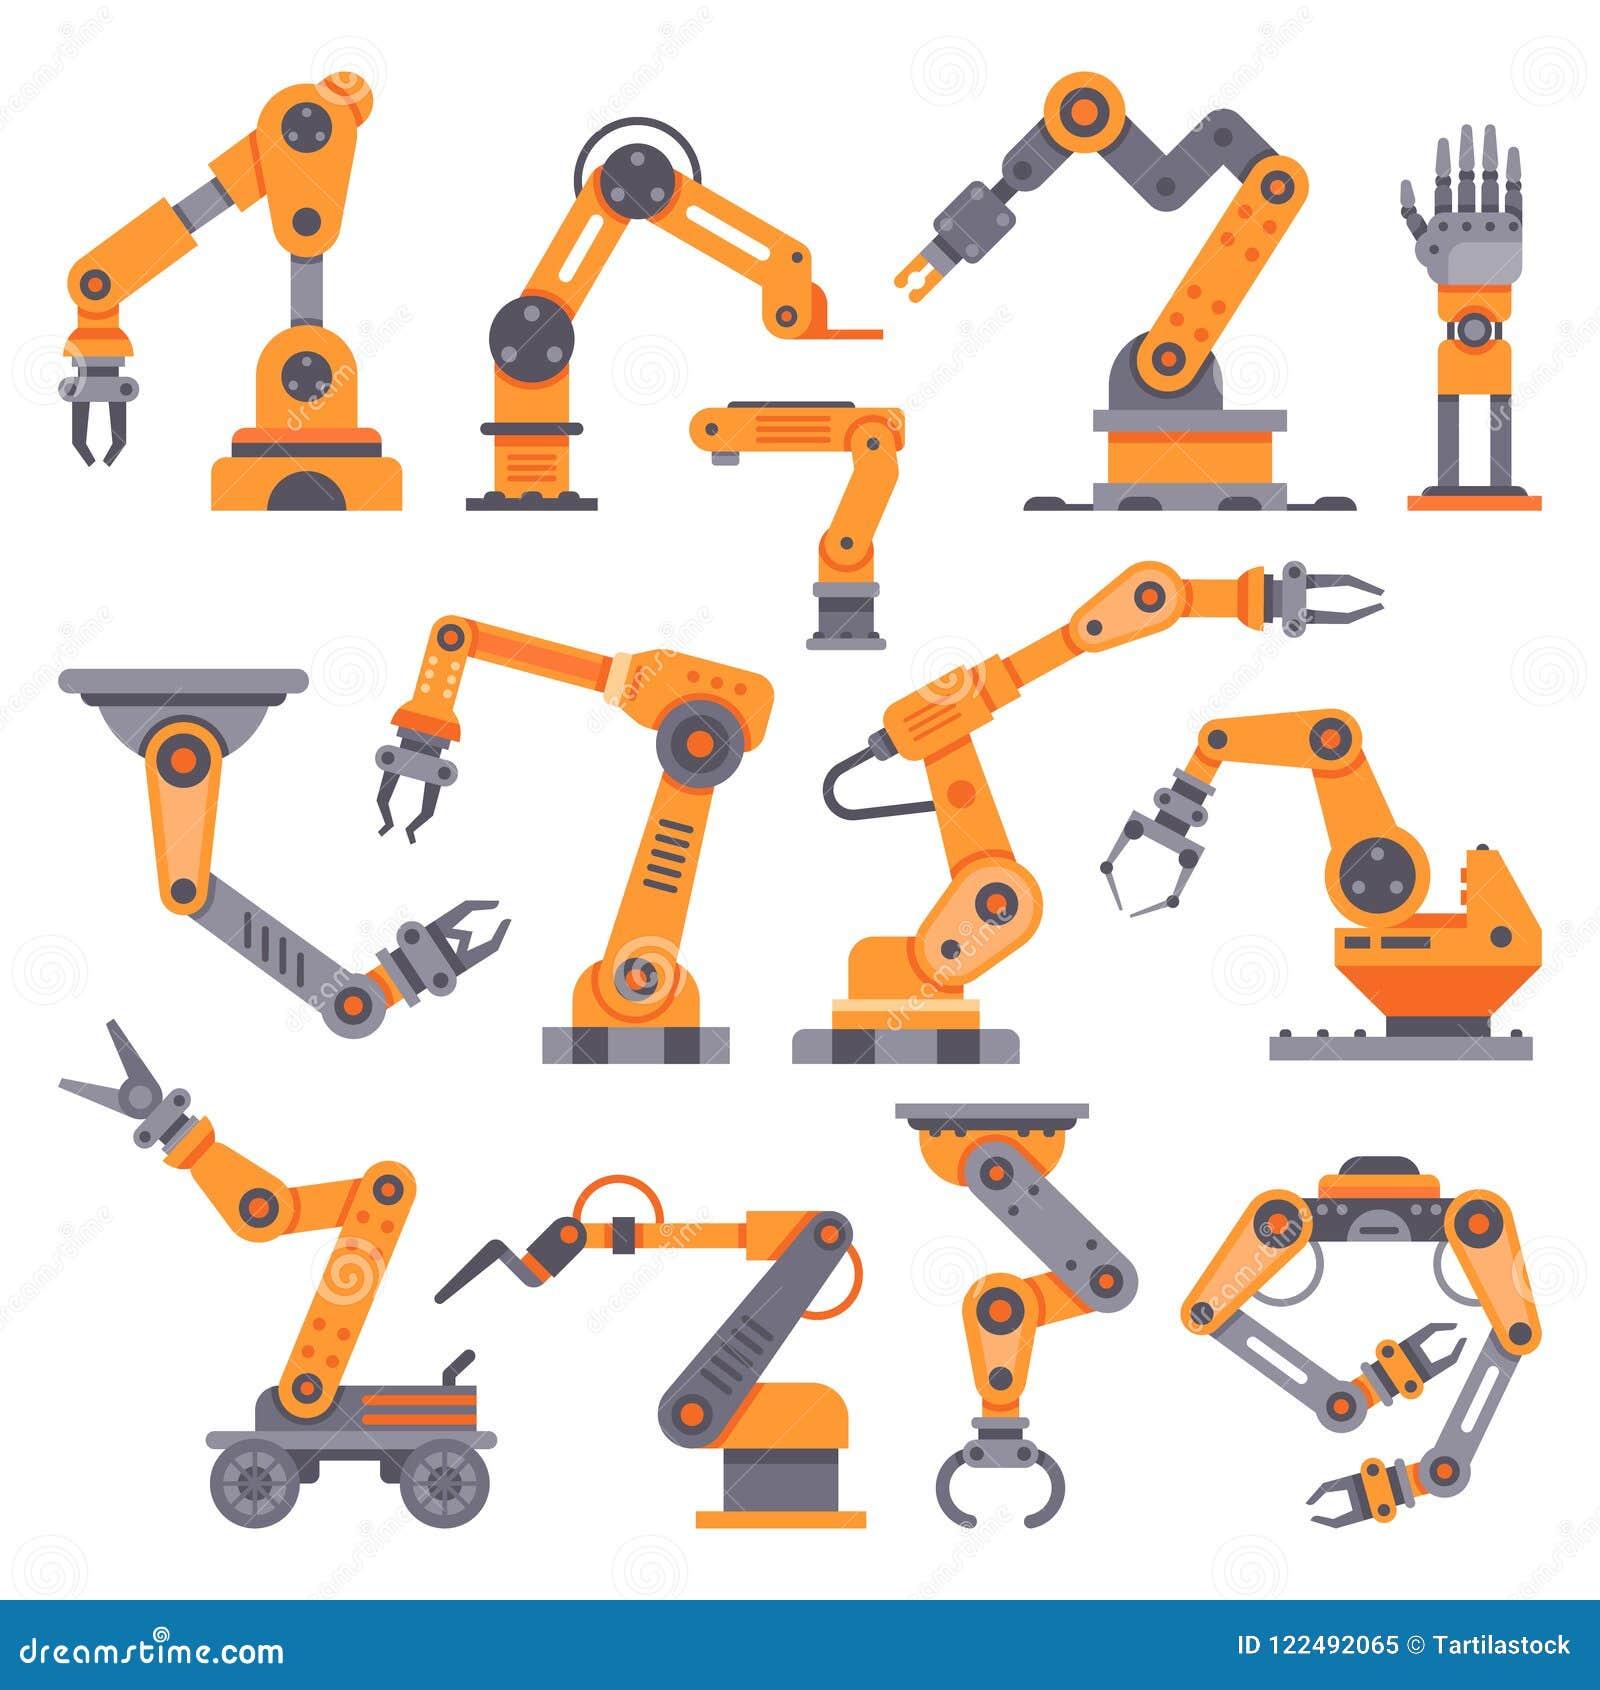 Flat manufacture robotic arm. Automatic robot arms, auto factory conveyor industrial equipment. Electronics robots hands